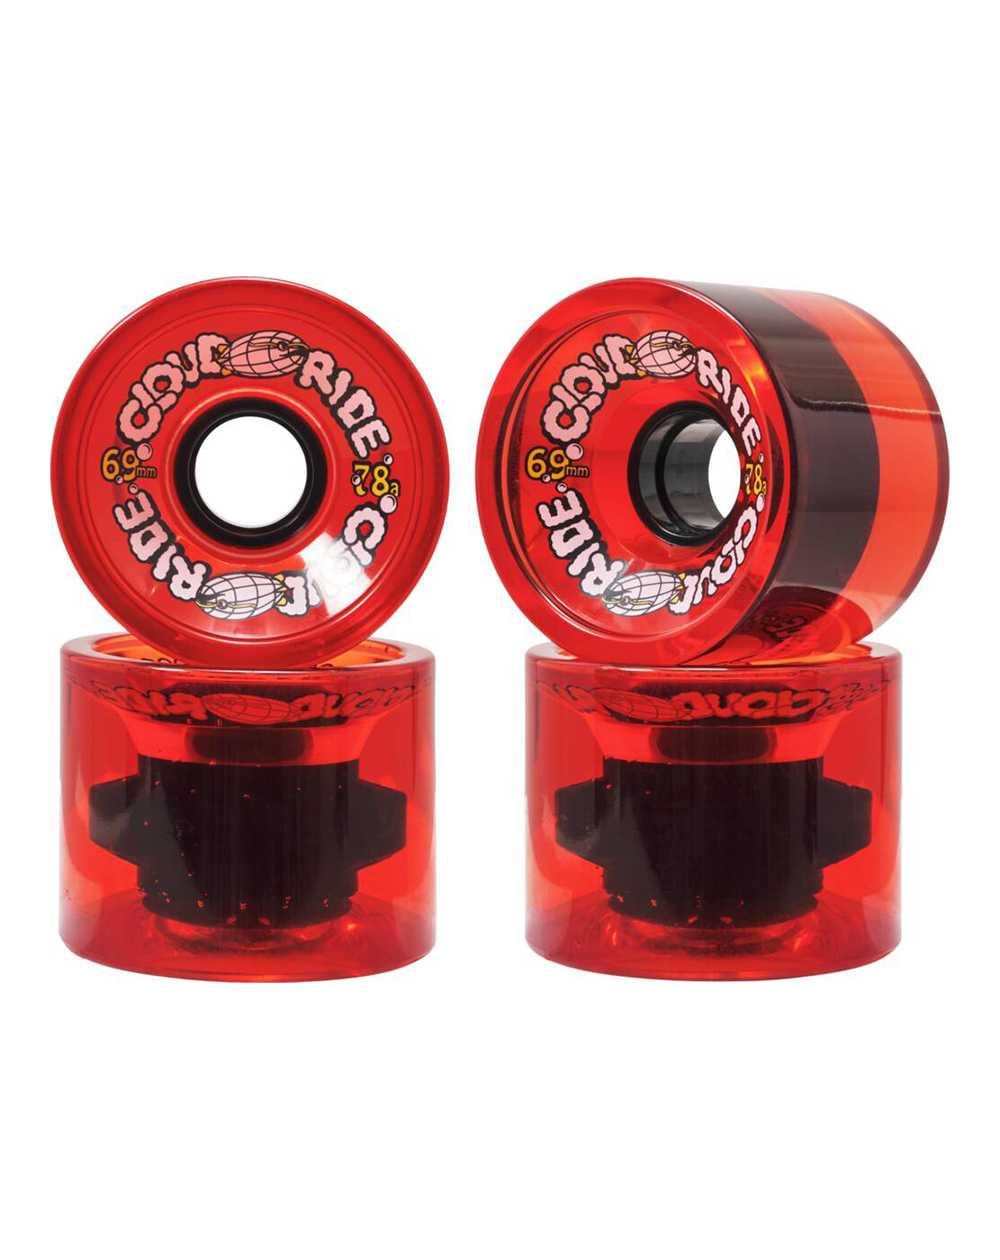 Cloud Ride 69mm Longboard Wheels Translucent Red